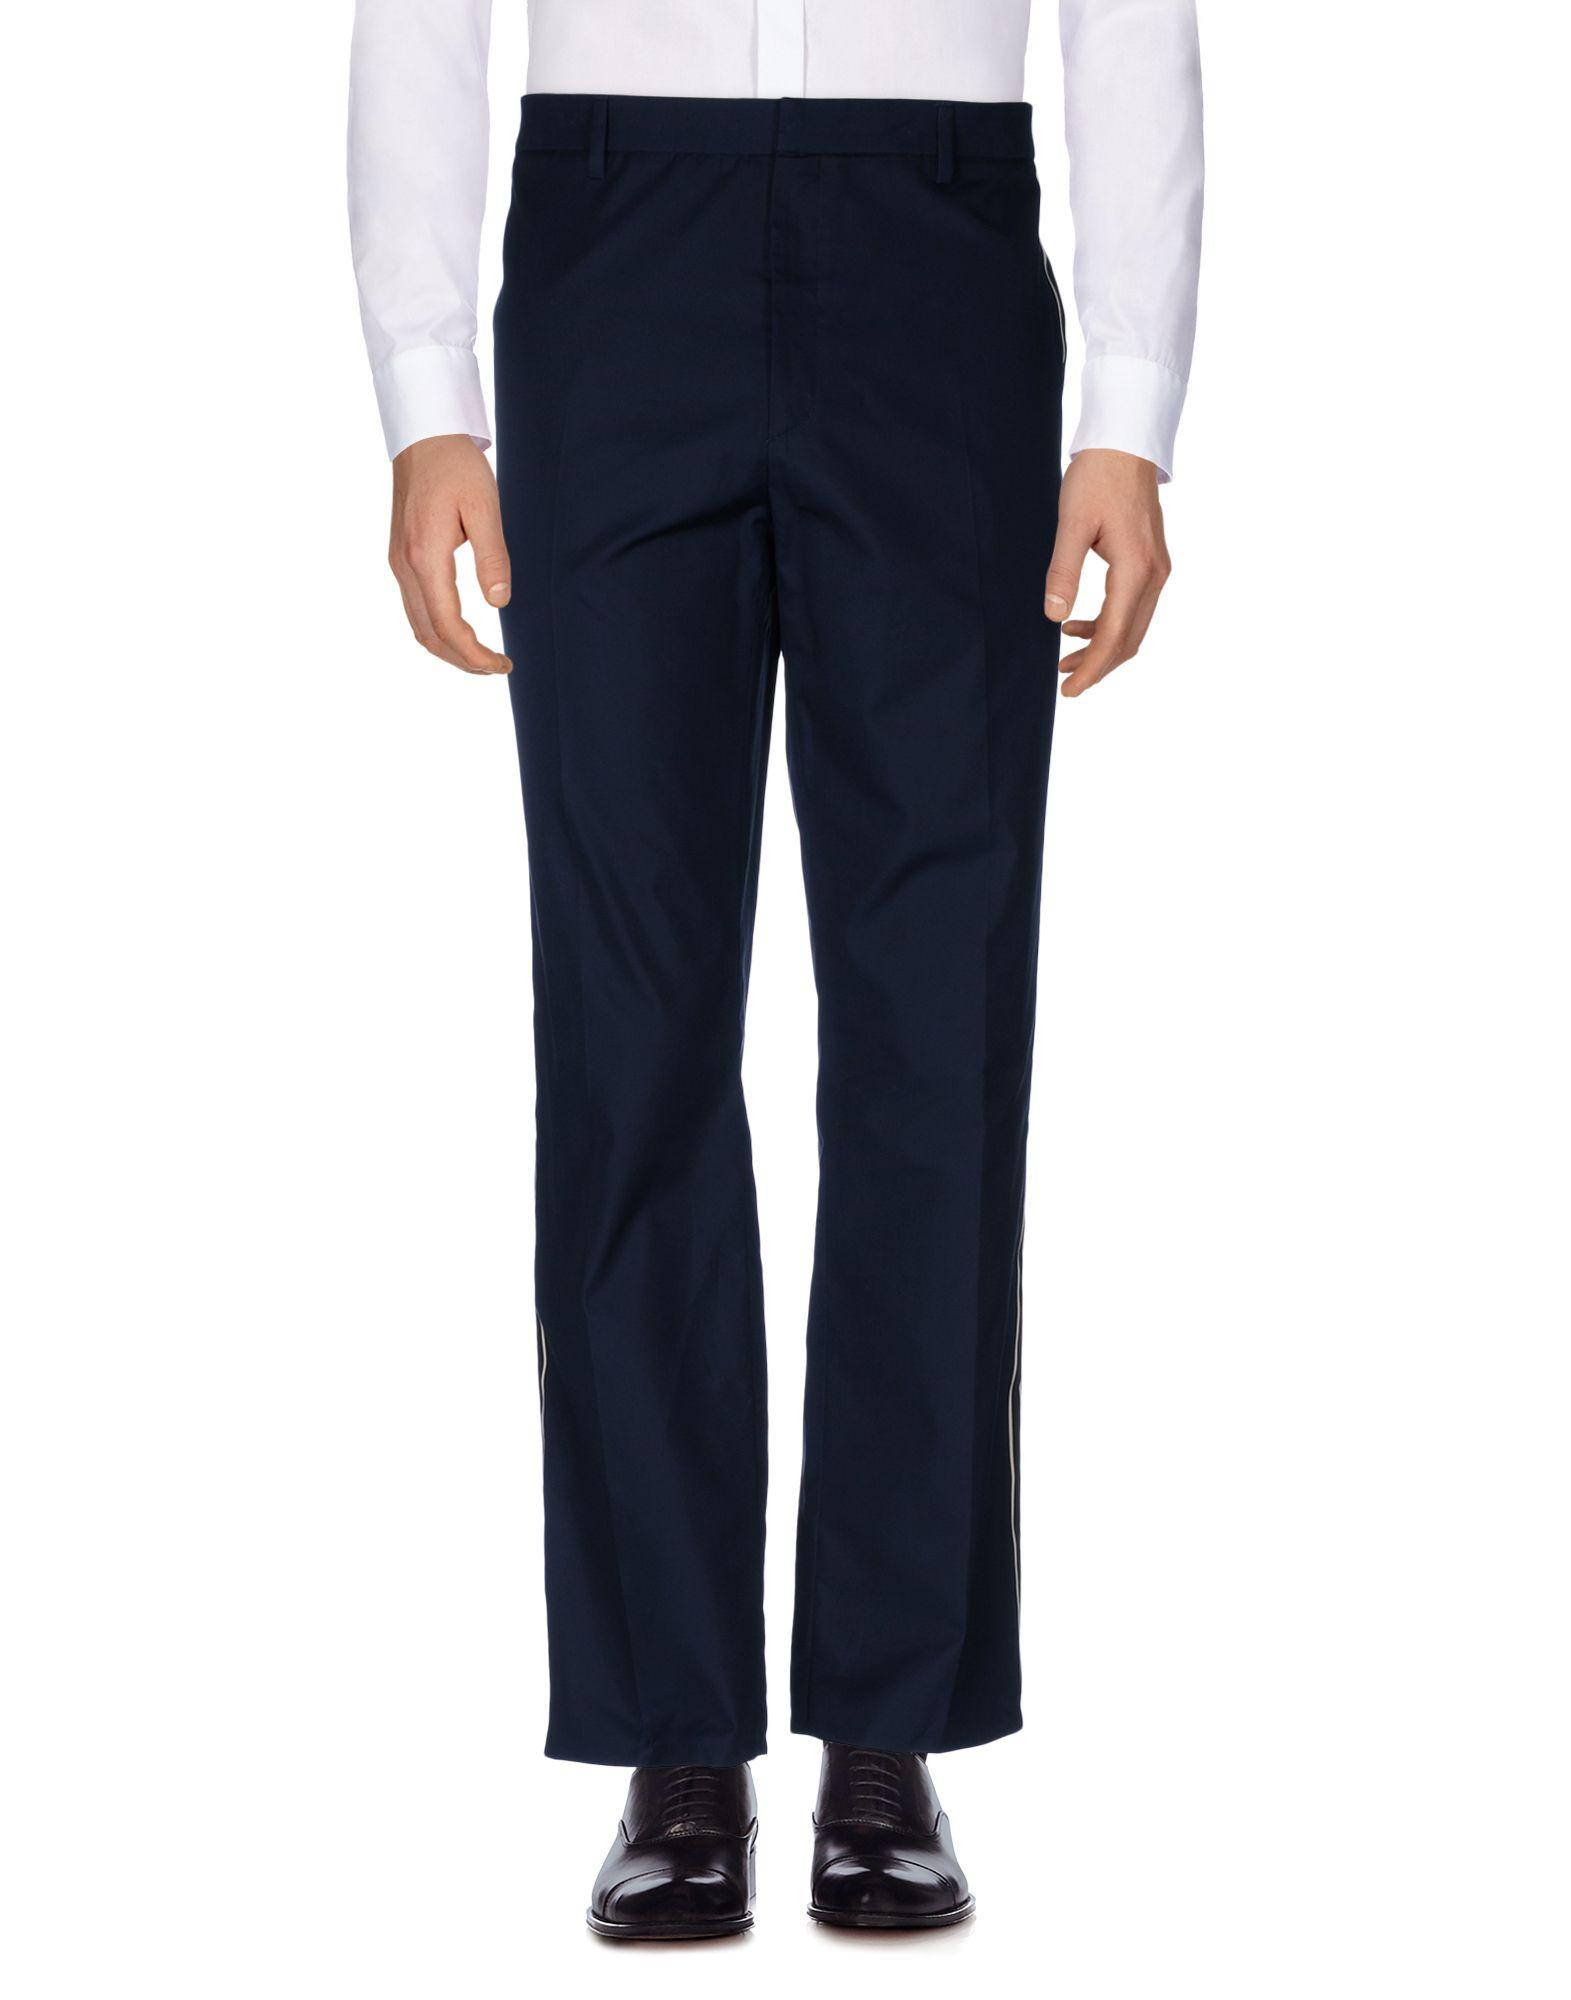 Pantalone N° 21 Uomo - Acquista online su